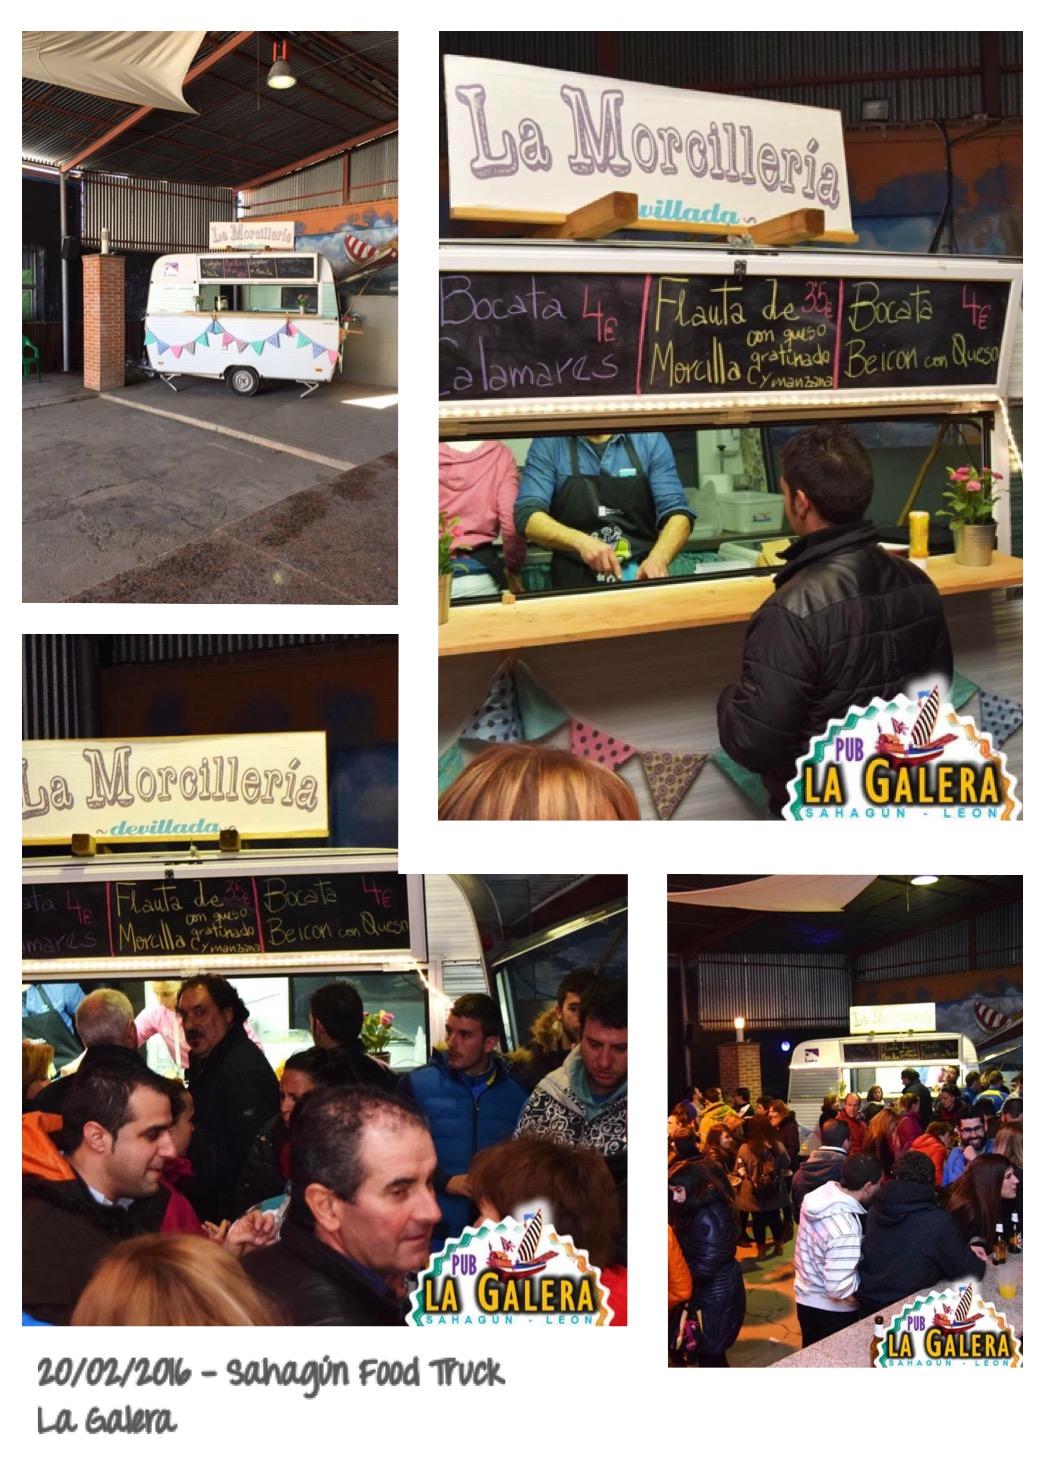 Sahagún Food Truck La Galera